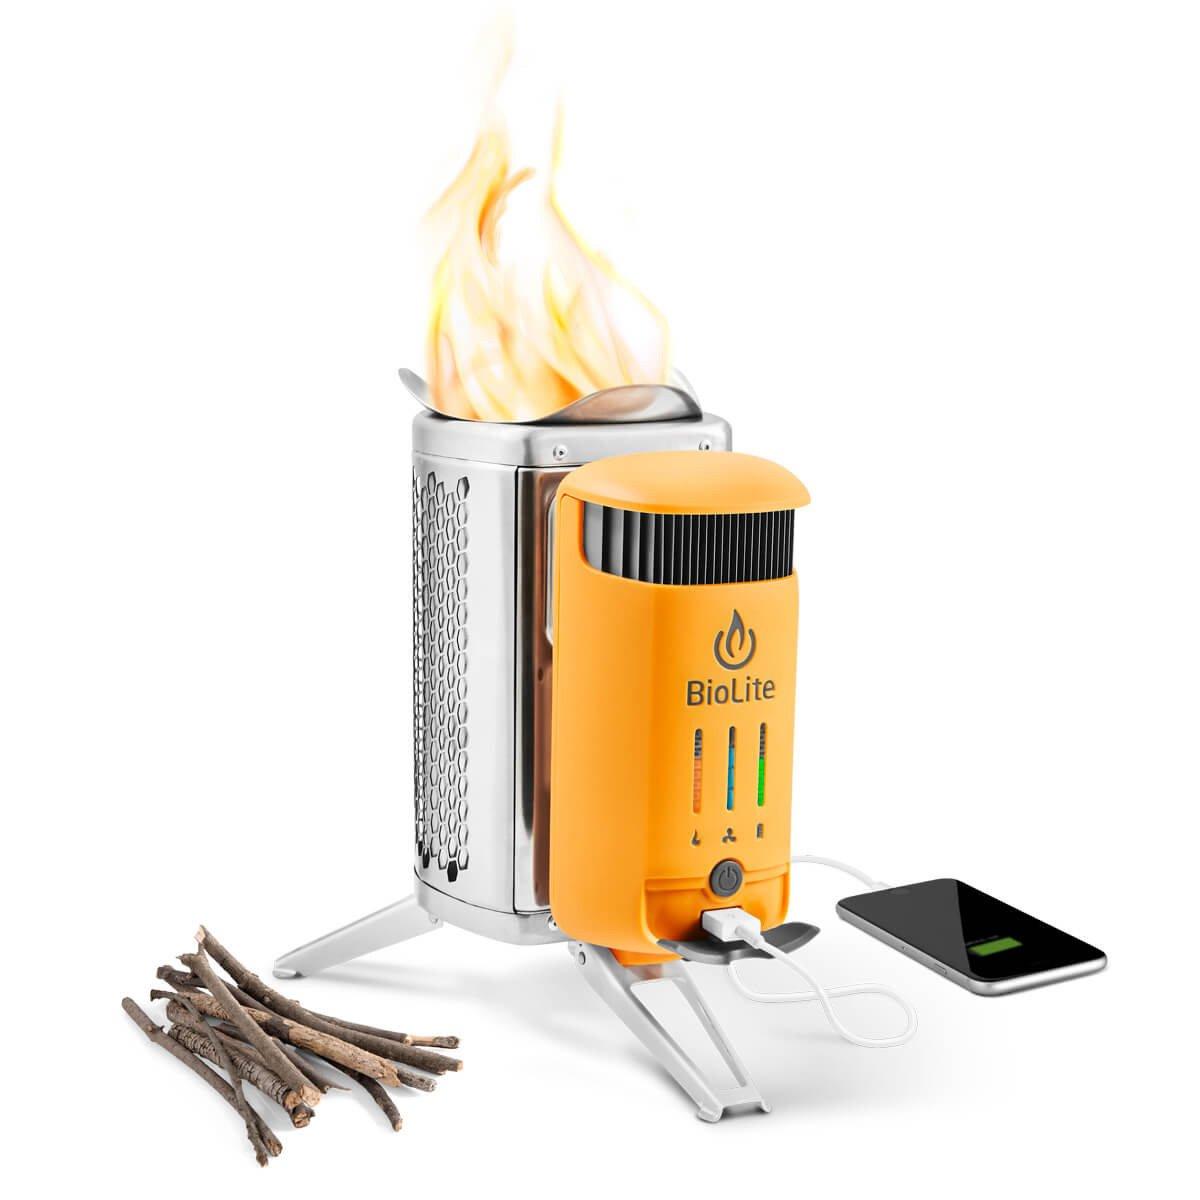 BioLite CampStove Campstove 2 Wood Burning & USB Charging Camp Stove